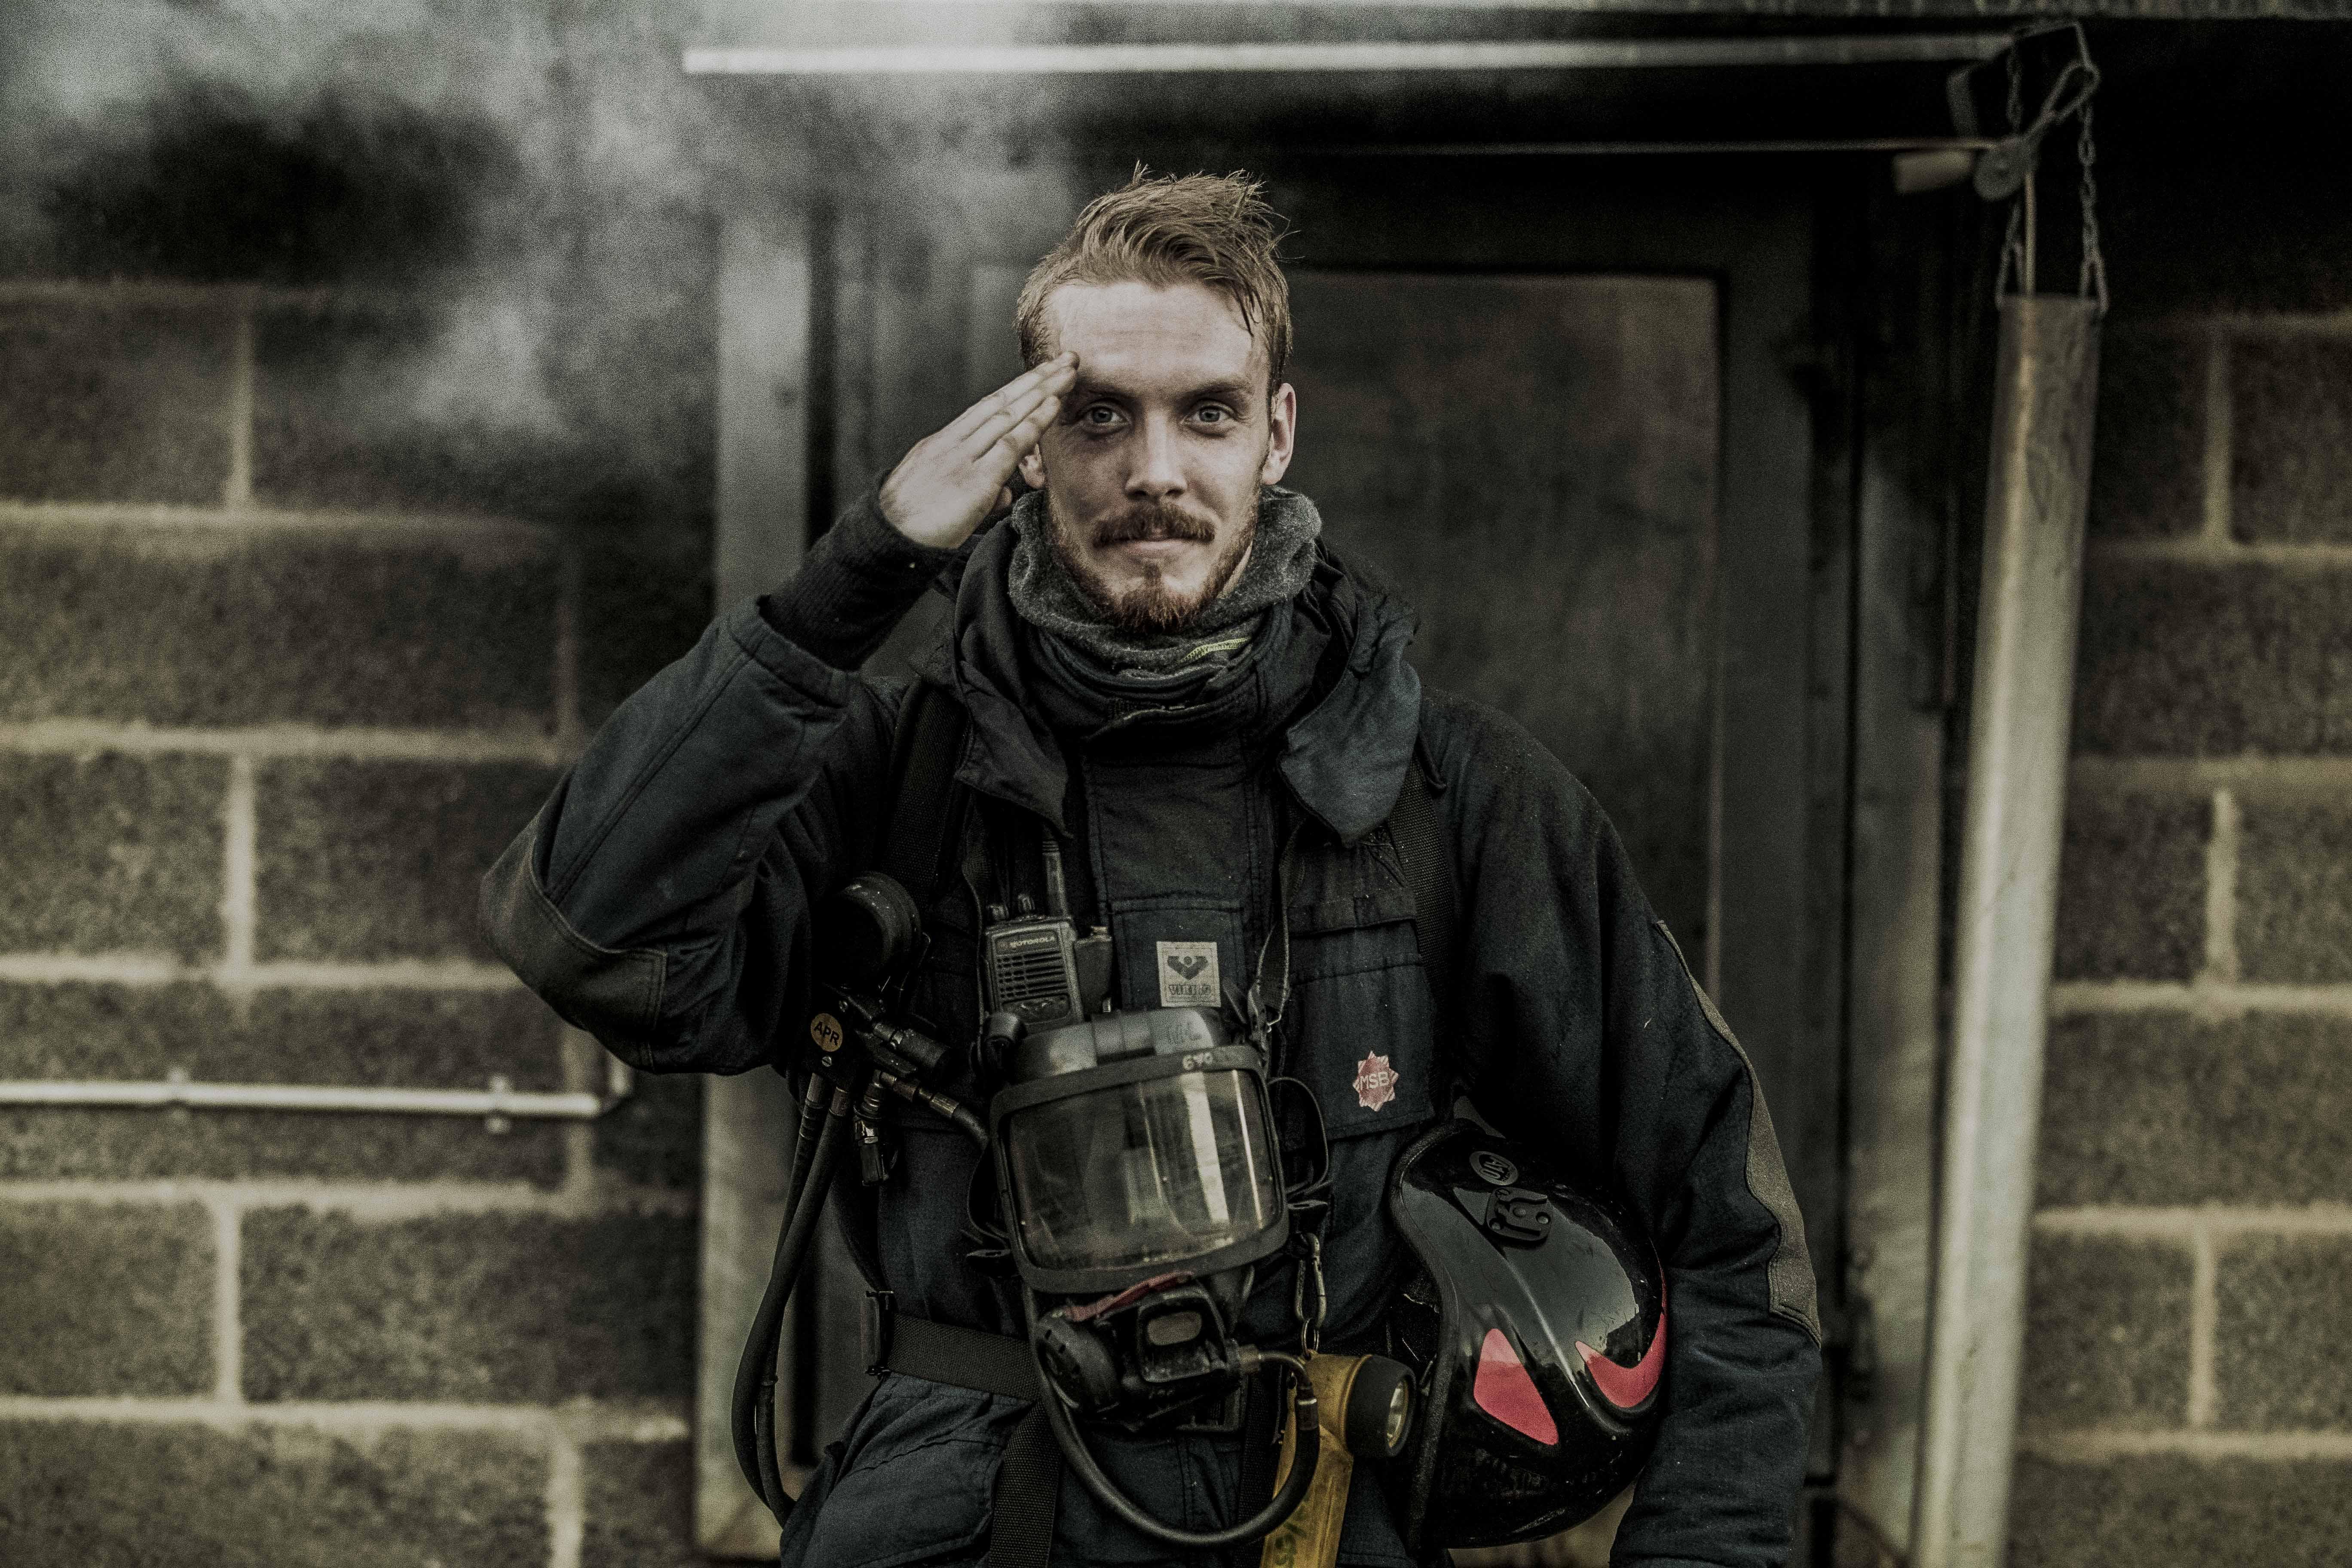 MSB revinge, brandman